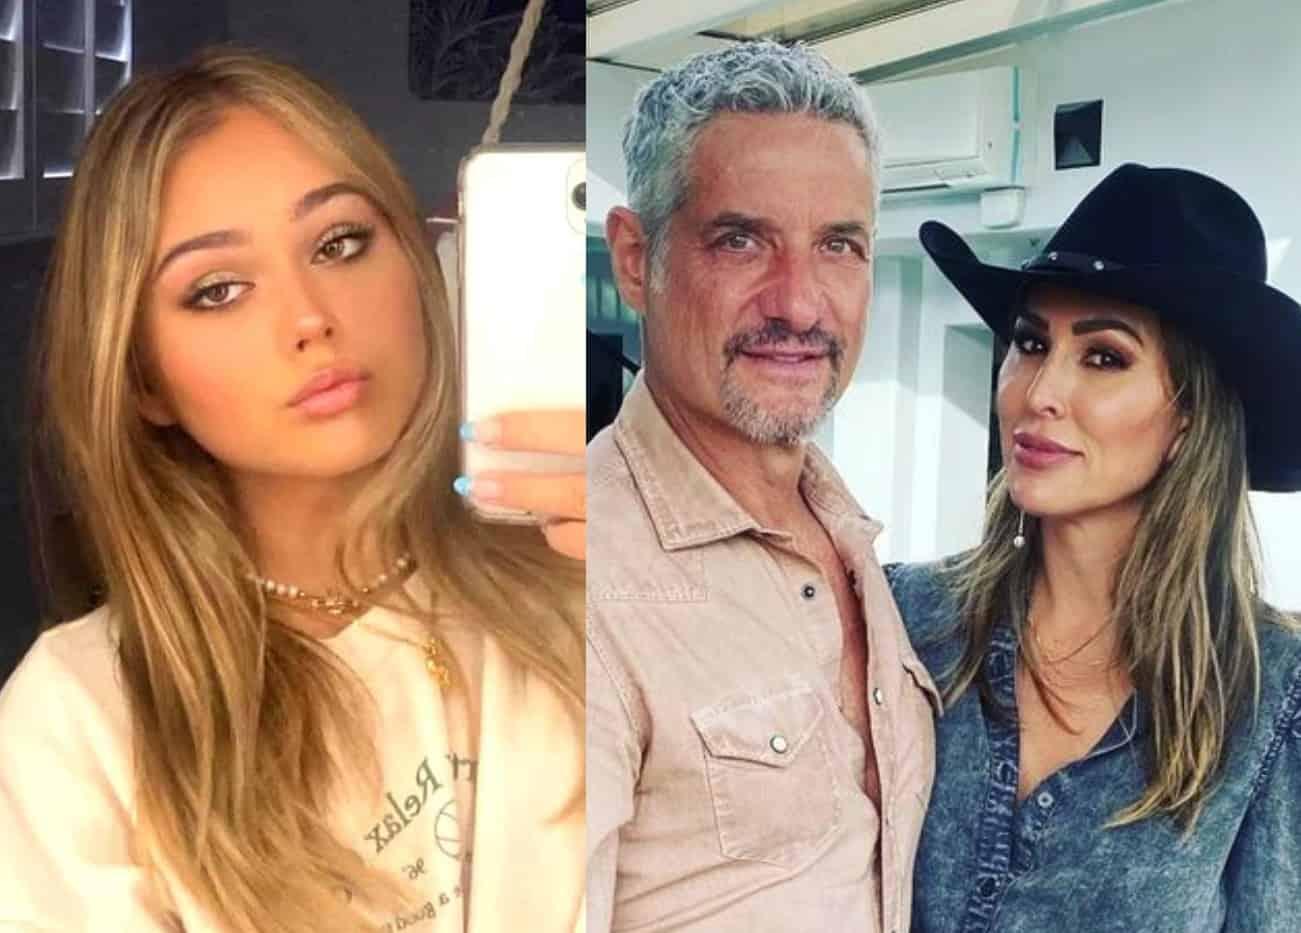 RHOC Alum Kelly Dodd's Daughter Jolie Defends Rick Leventhal After Fan Trolls Him as Kelly Reacts